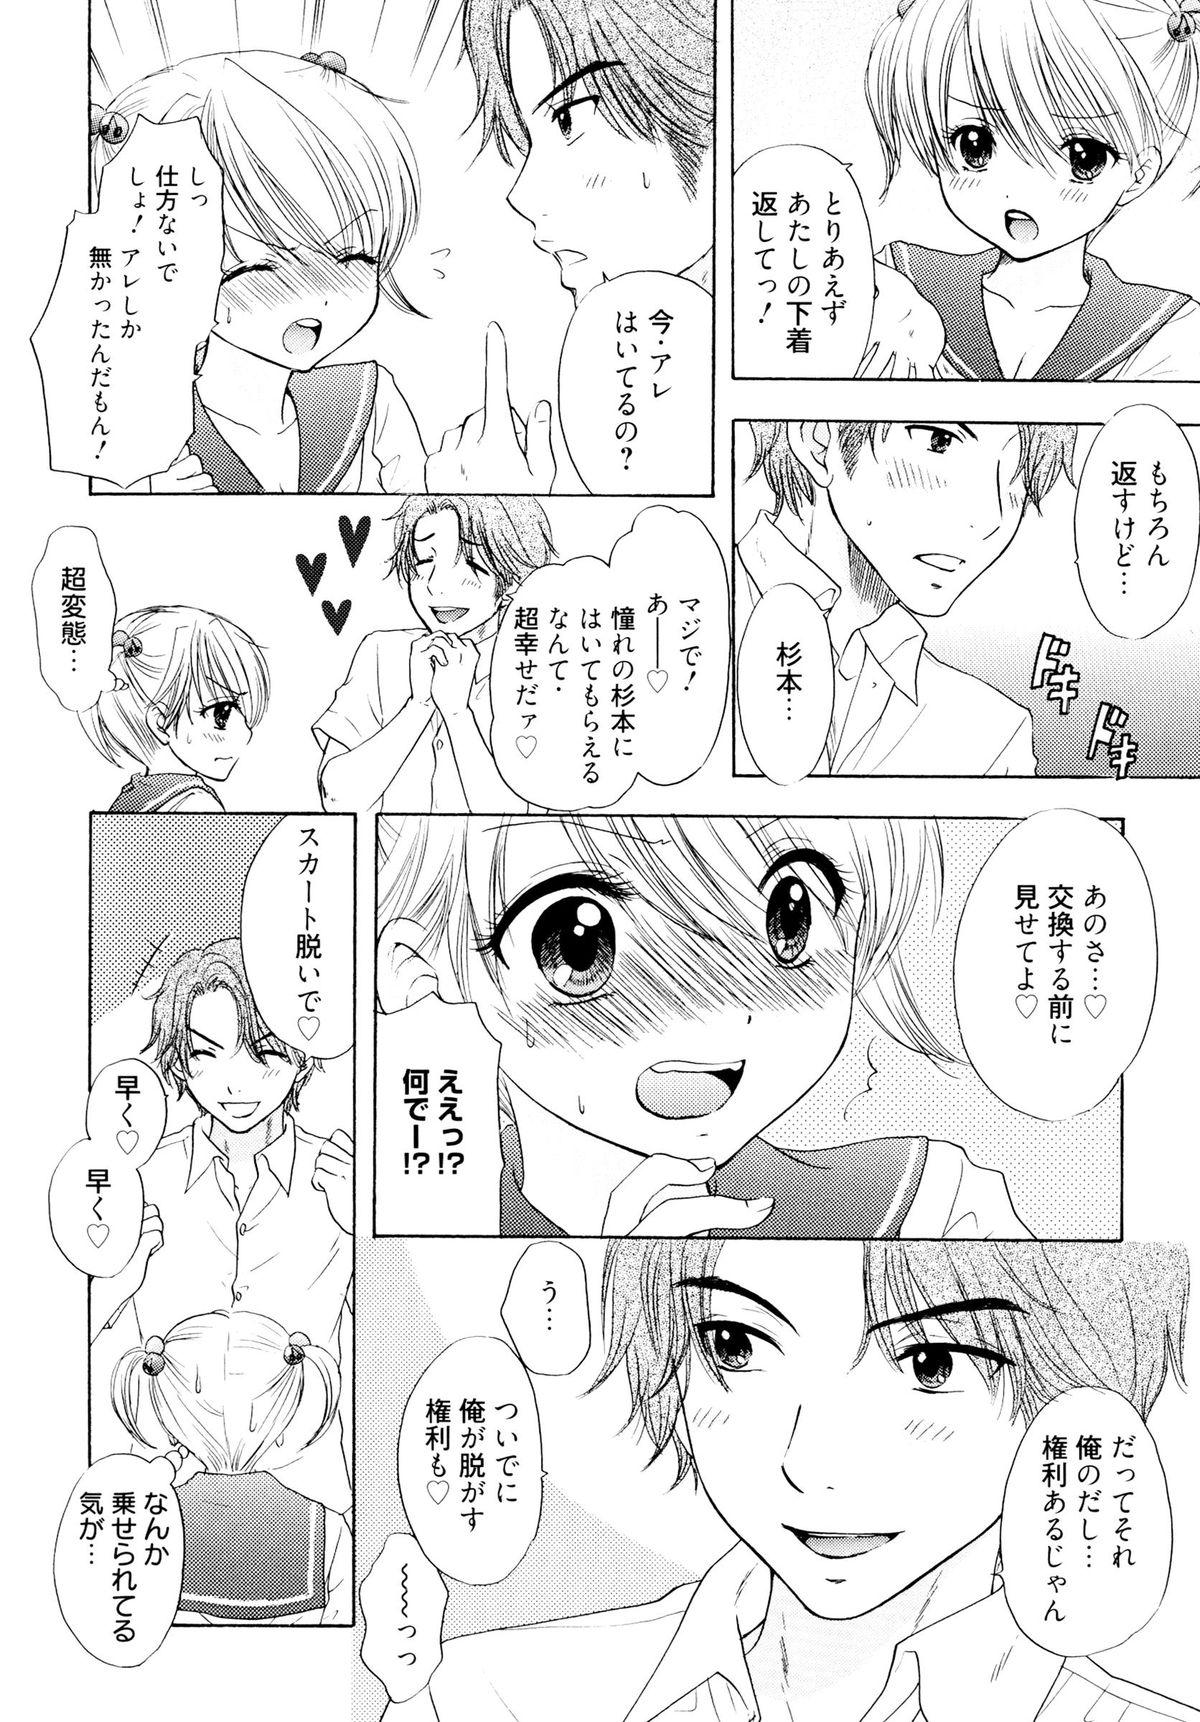 The Great Escape 4 Shokai Genteiban 75